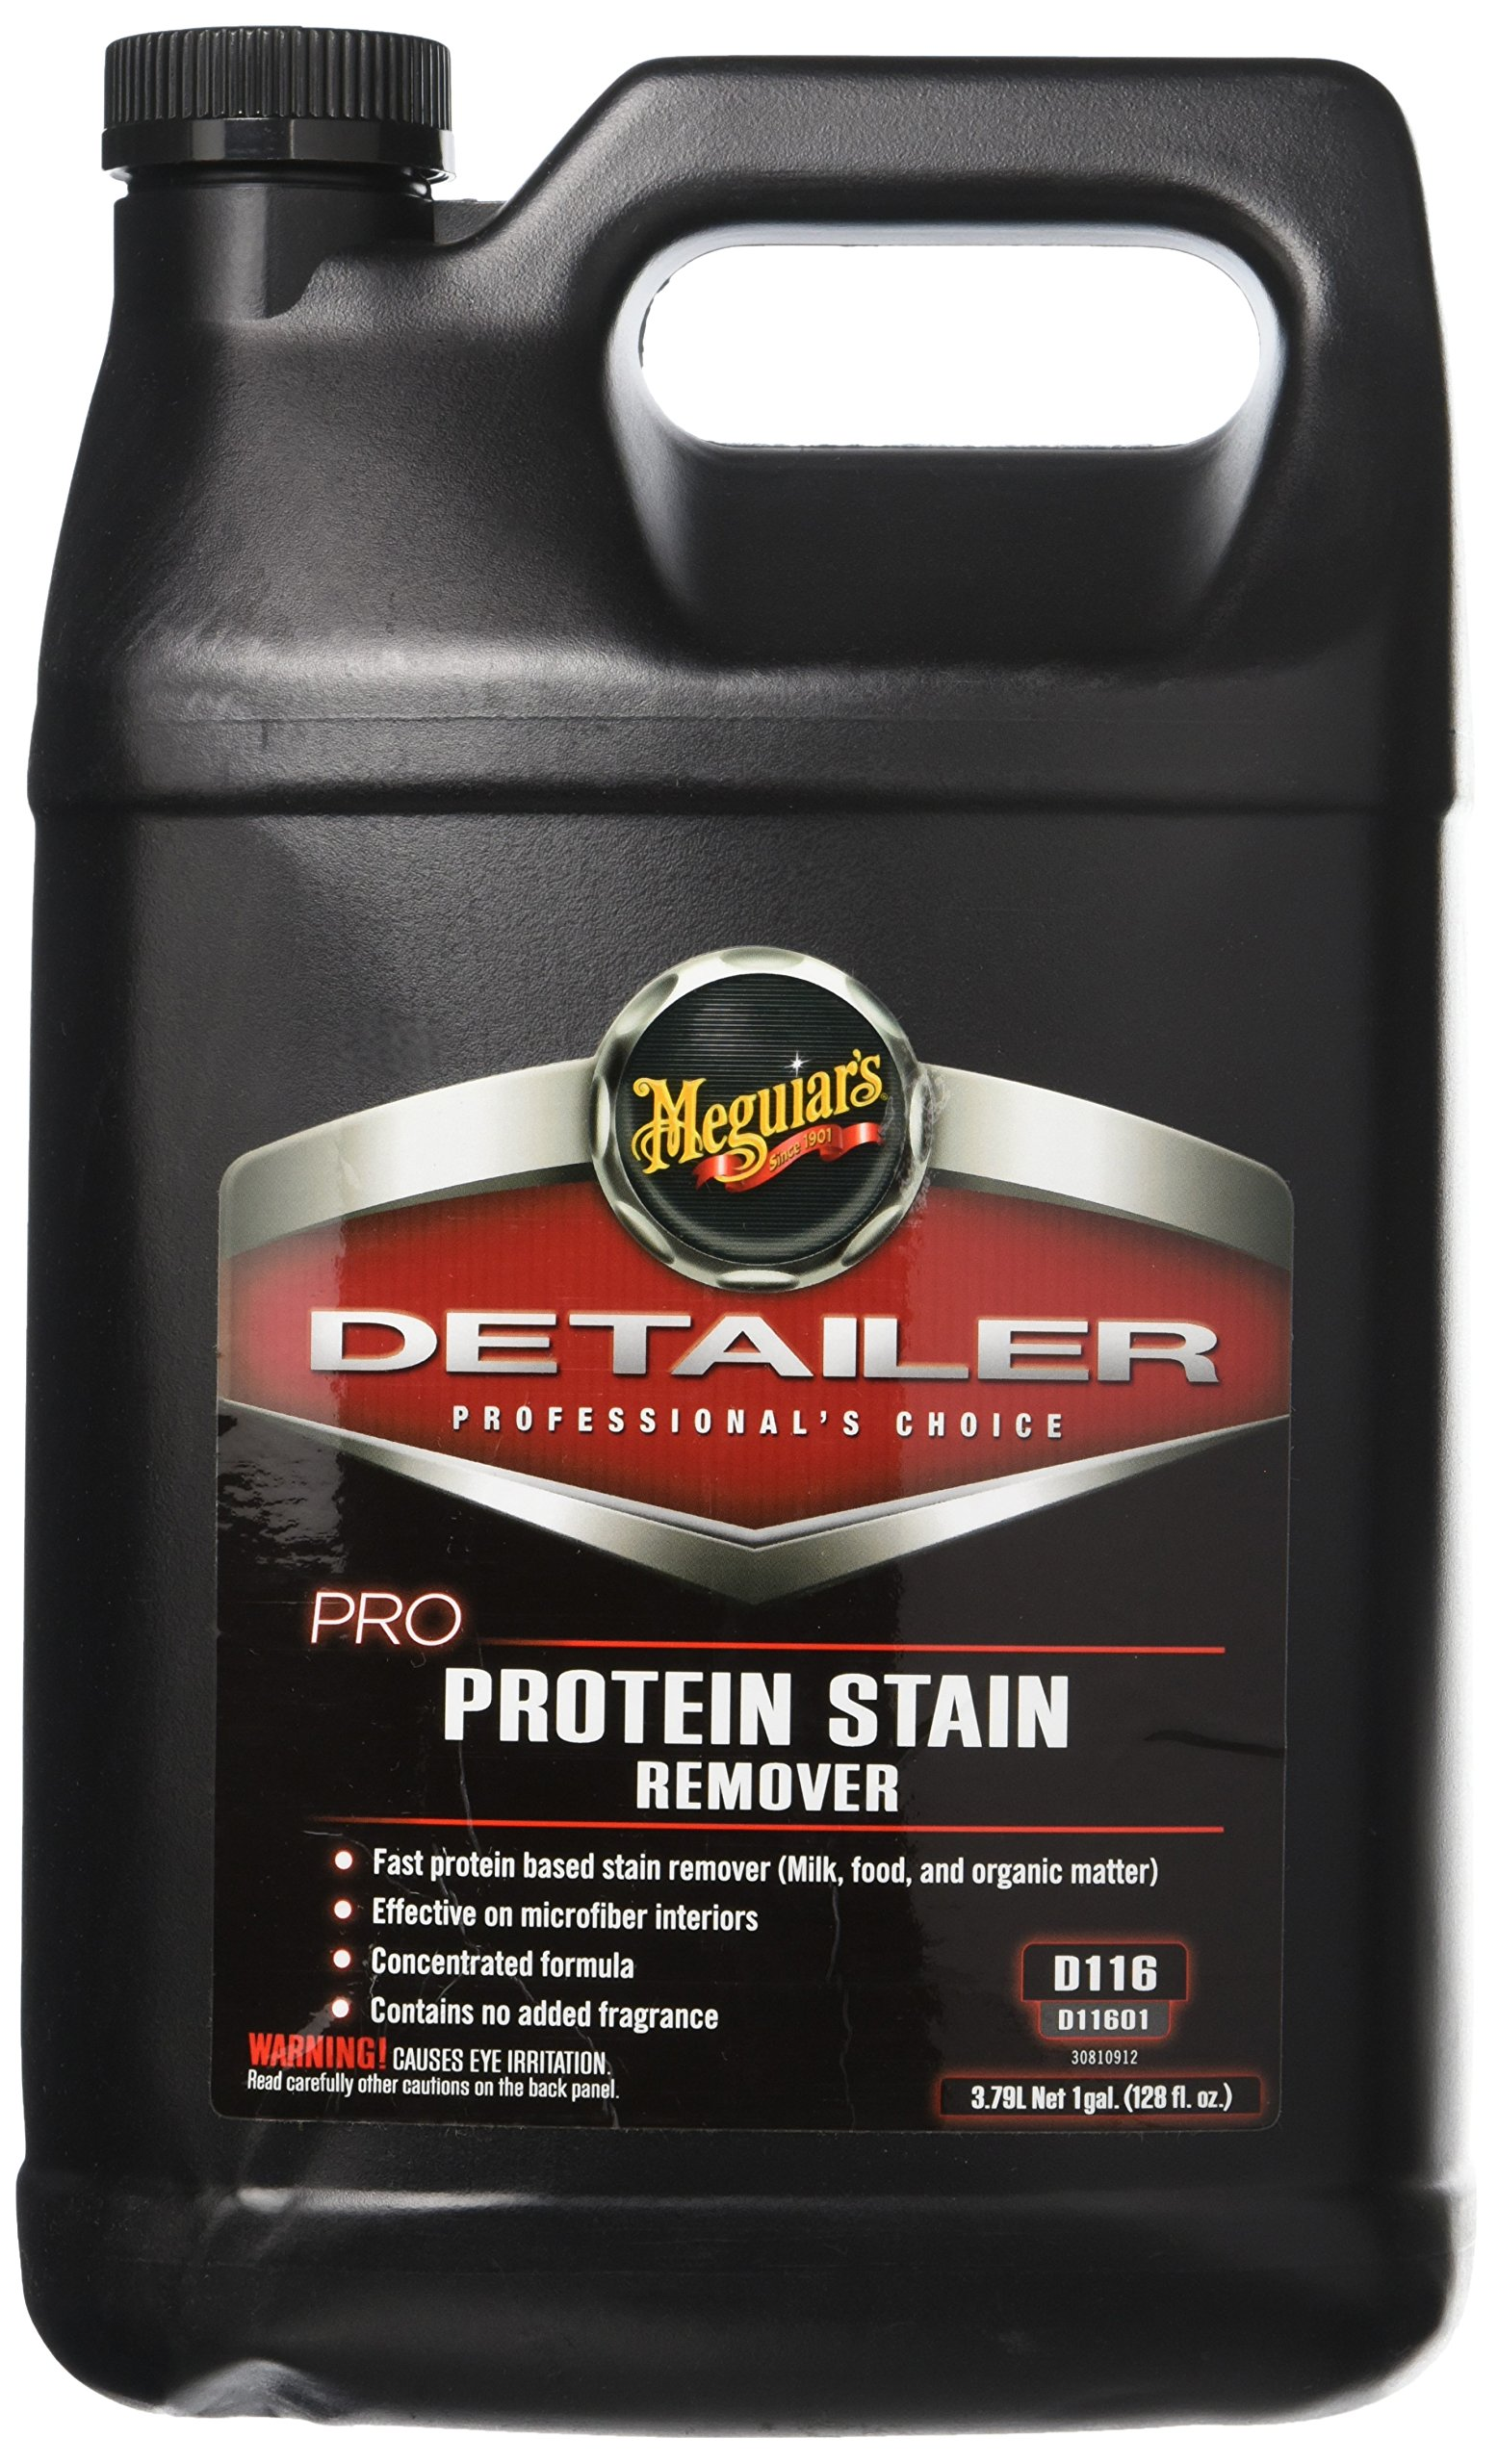 Meguiar's D11601 Pro Protein Stain Remover, 1 Gallon, 1 gallon, 1 Pack by Meguiar's